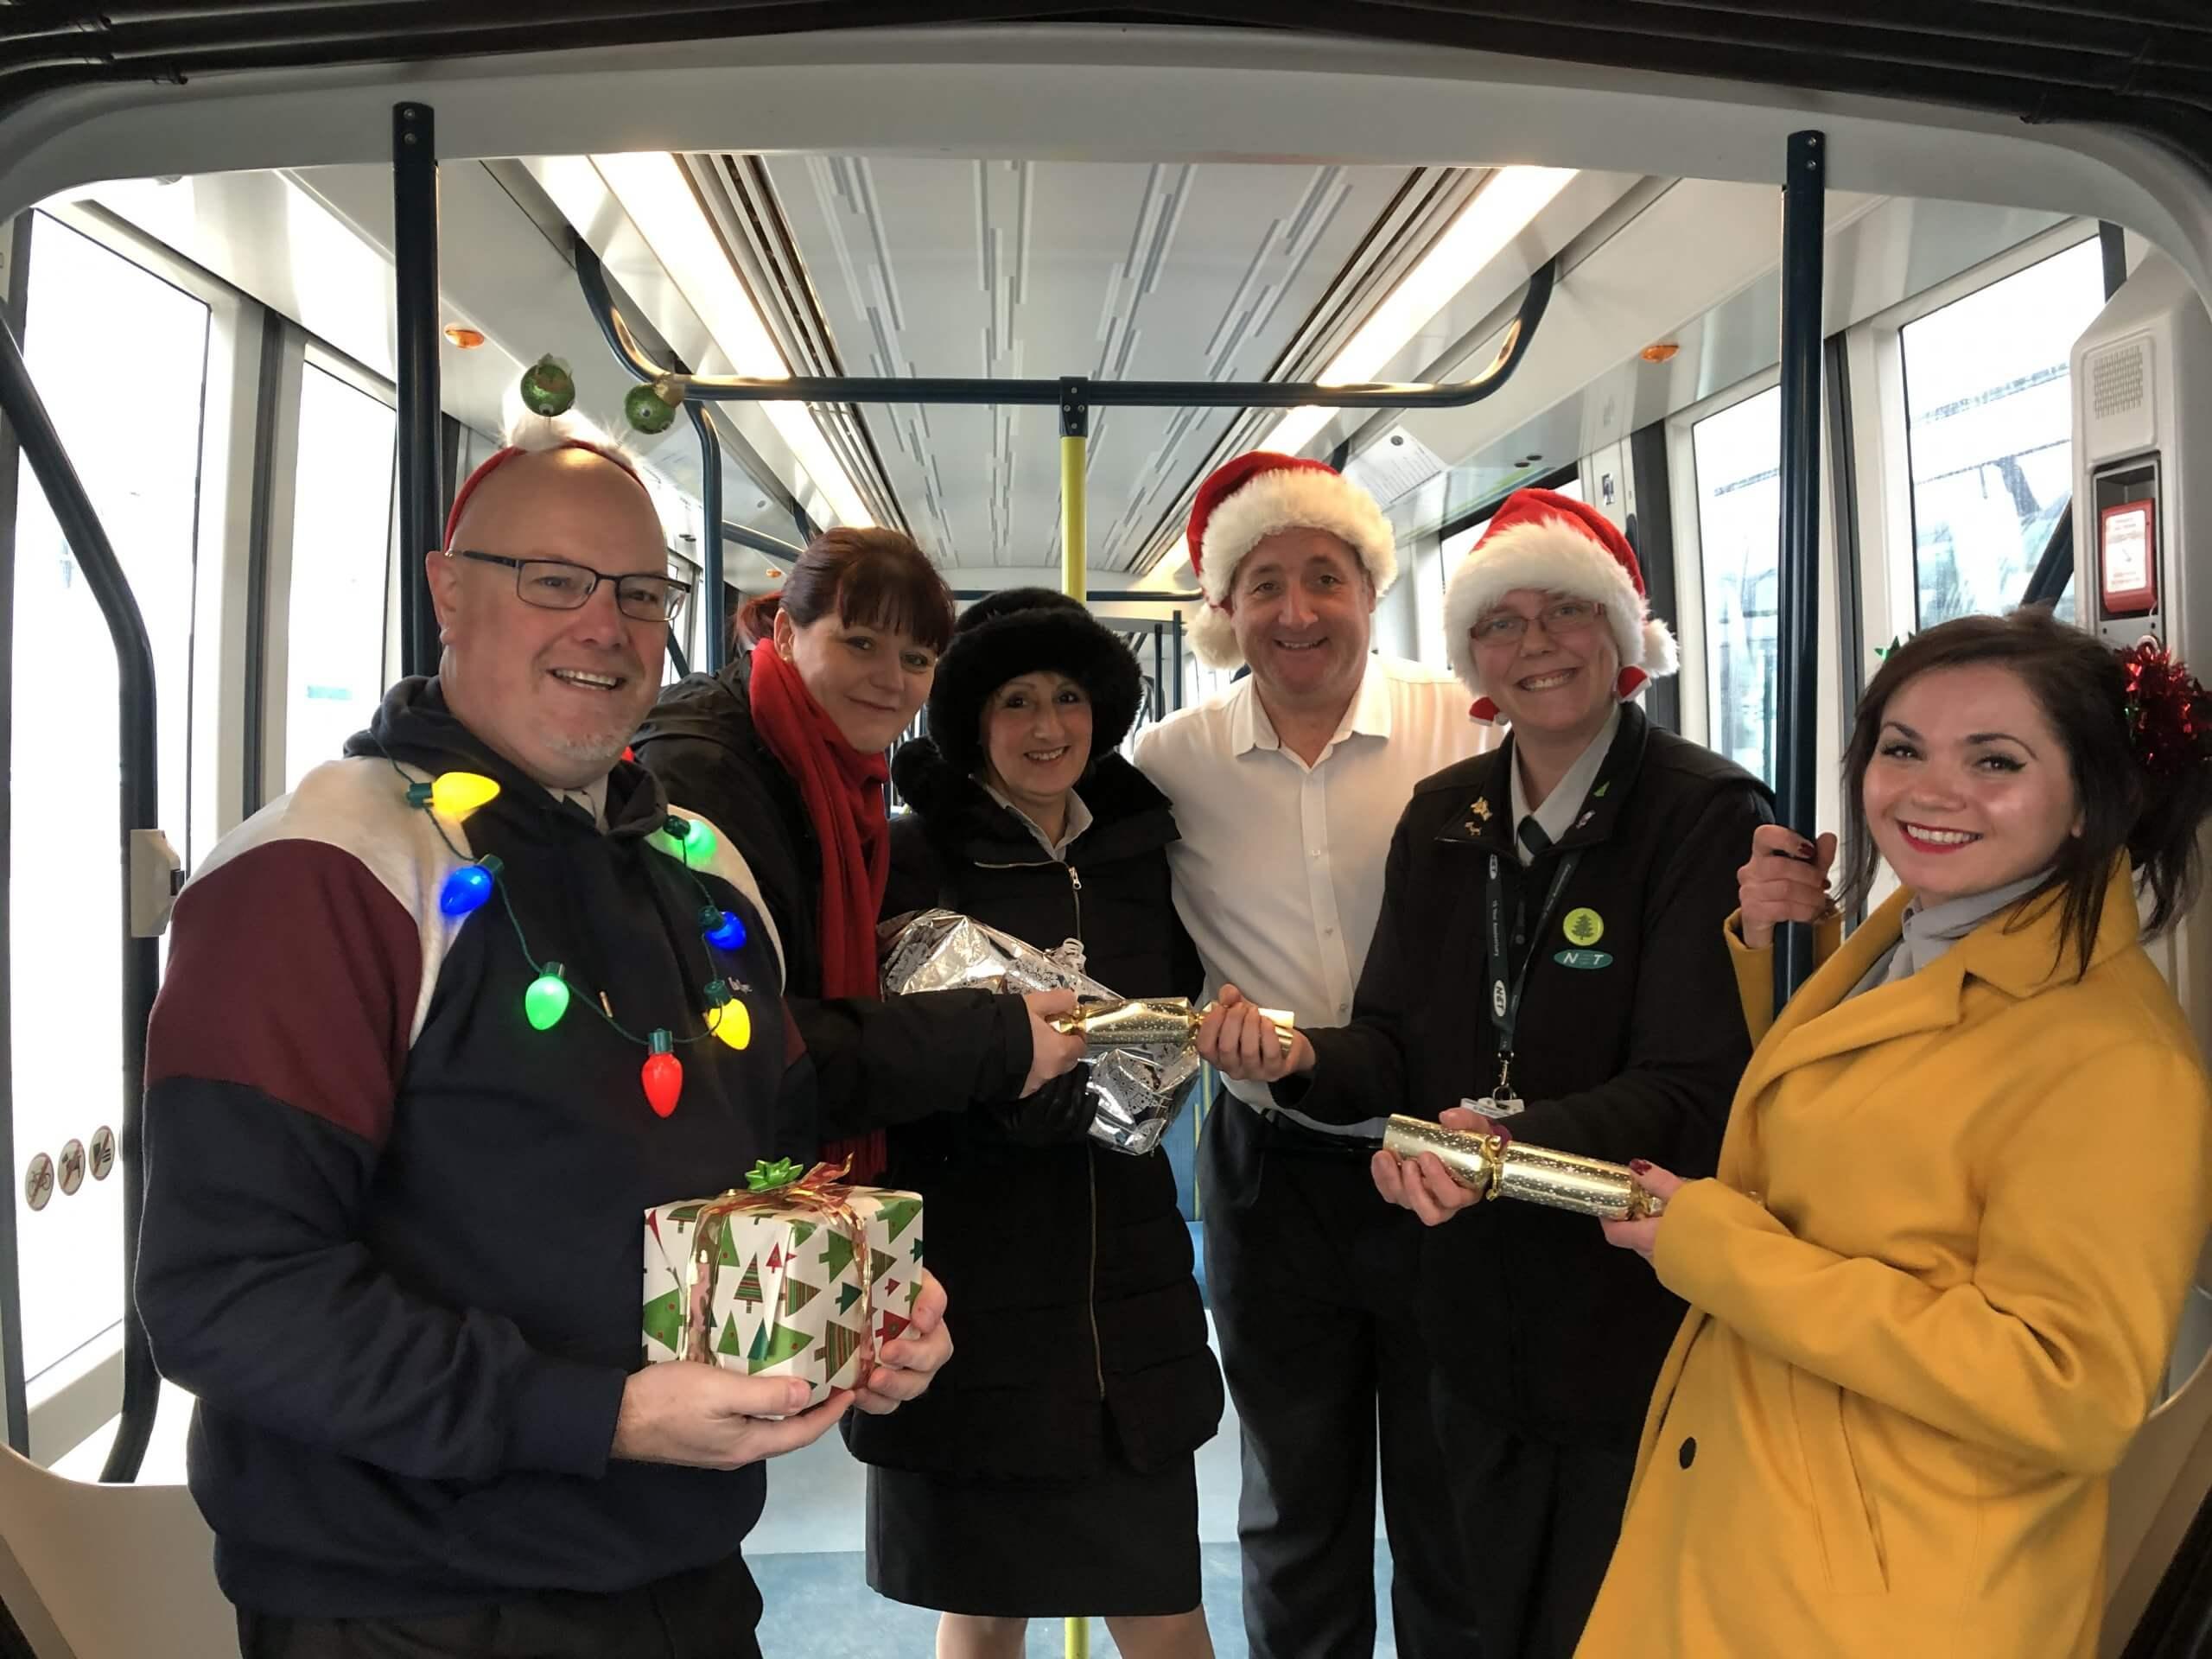 NET staff festively dressed